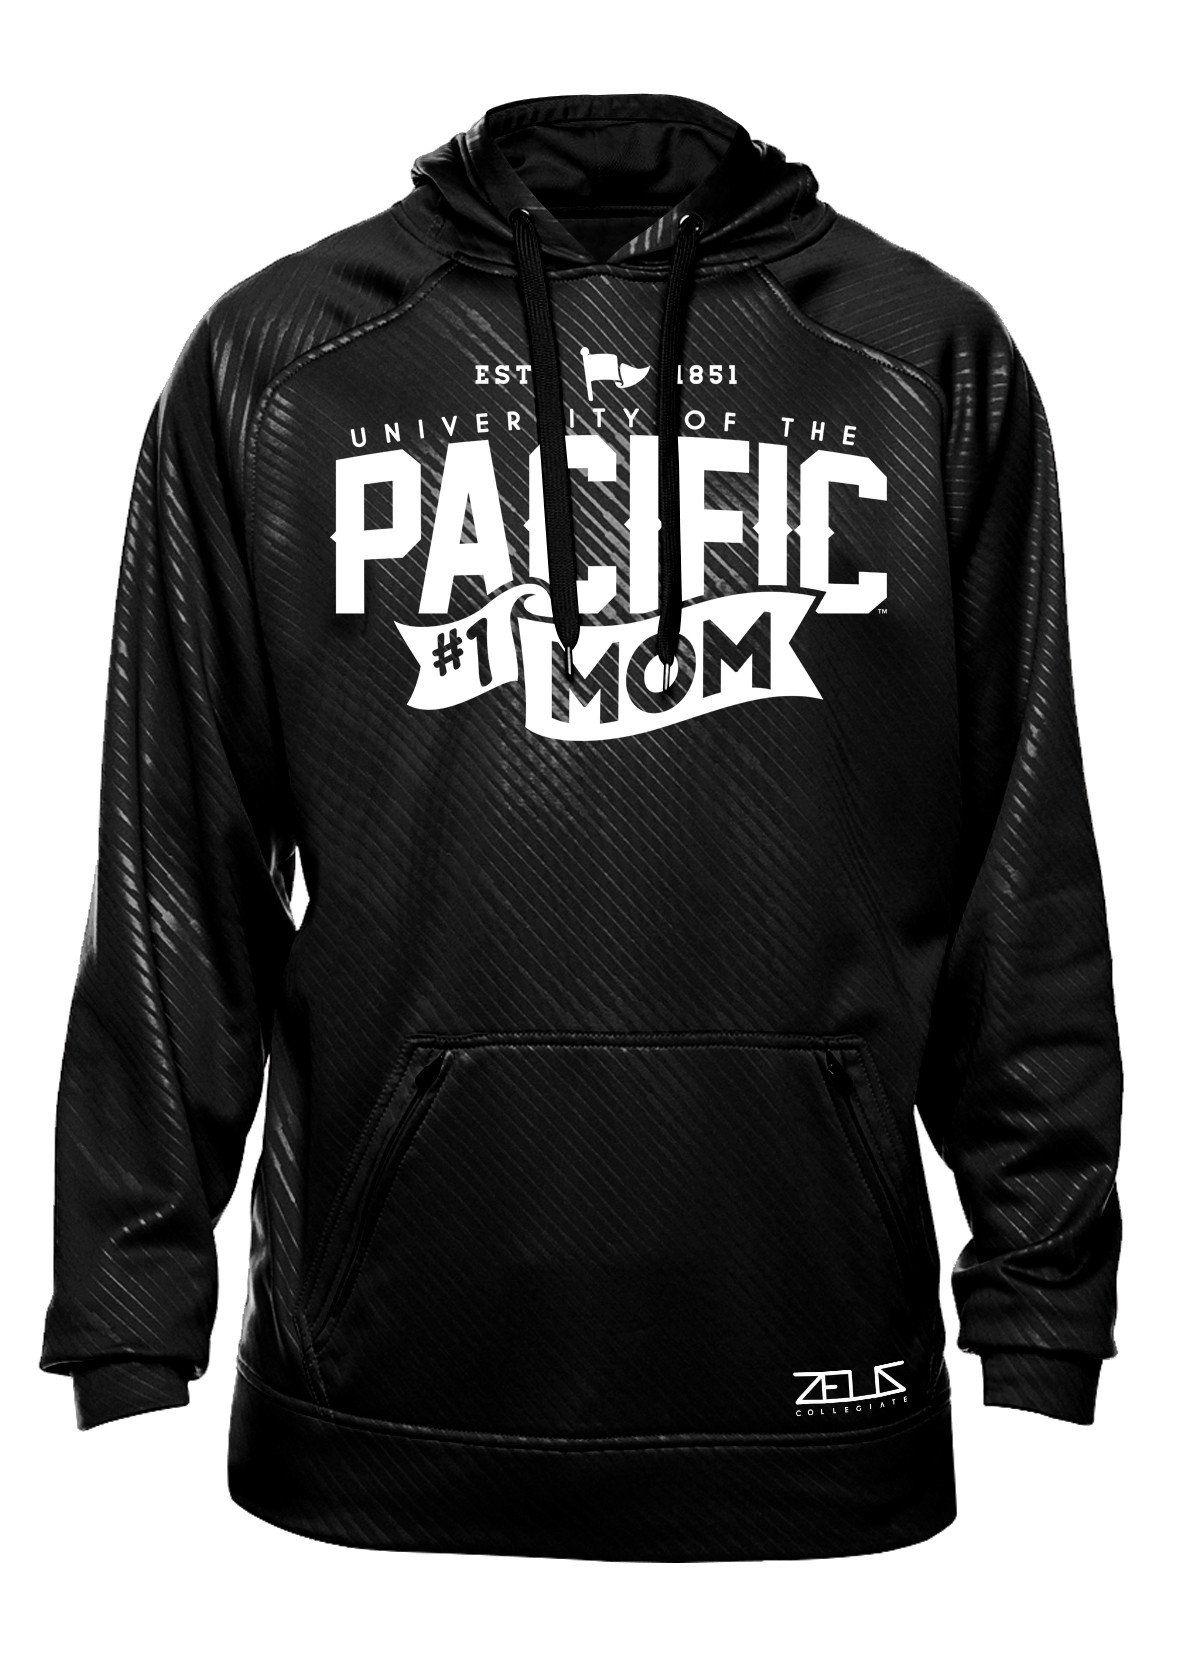 Pacific #1 Mom Poly Fleece Hood